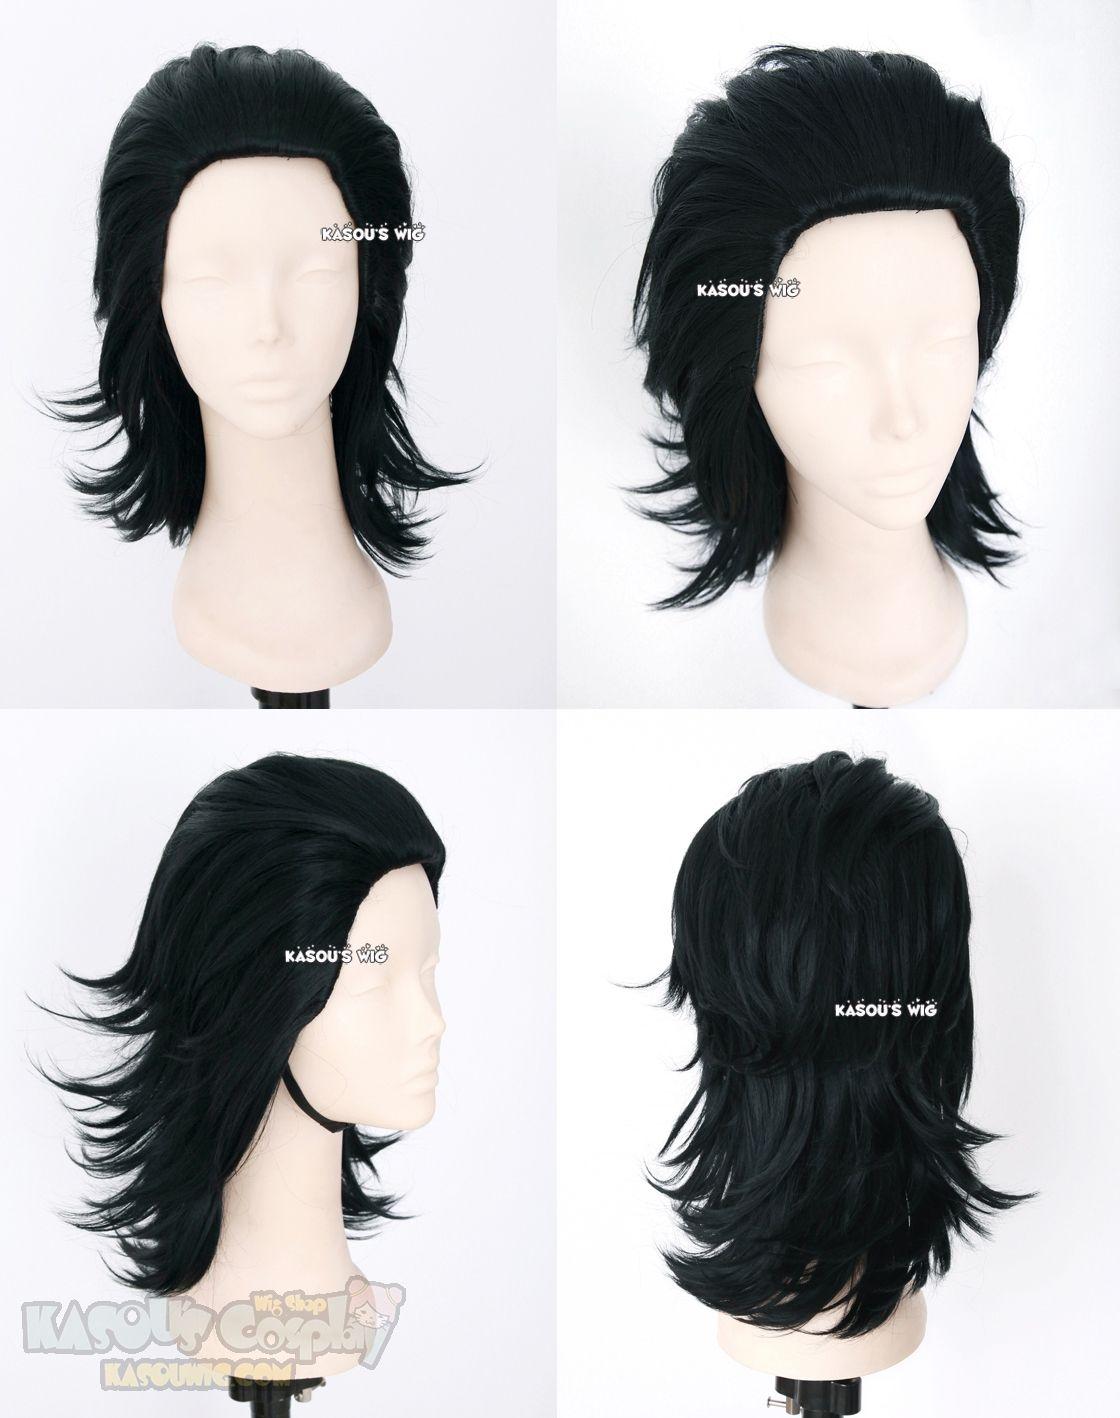 layers cosplay wig with widows peak Loki Laufeyson Avengers Thor version